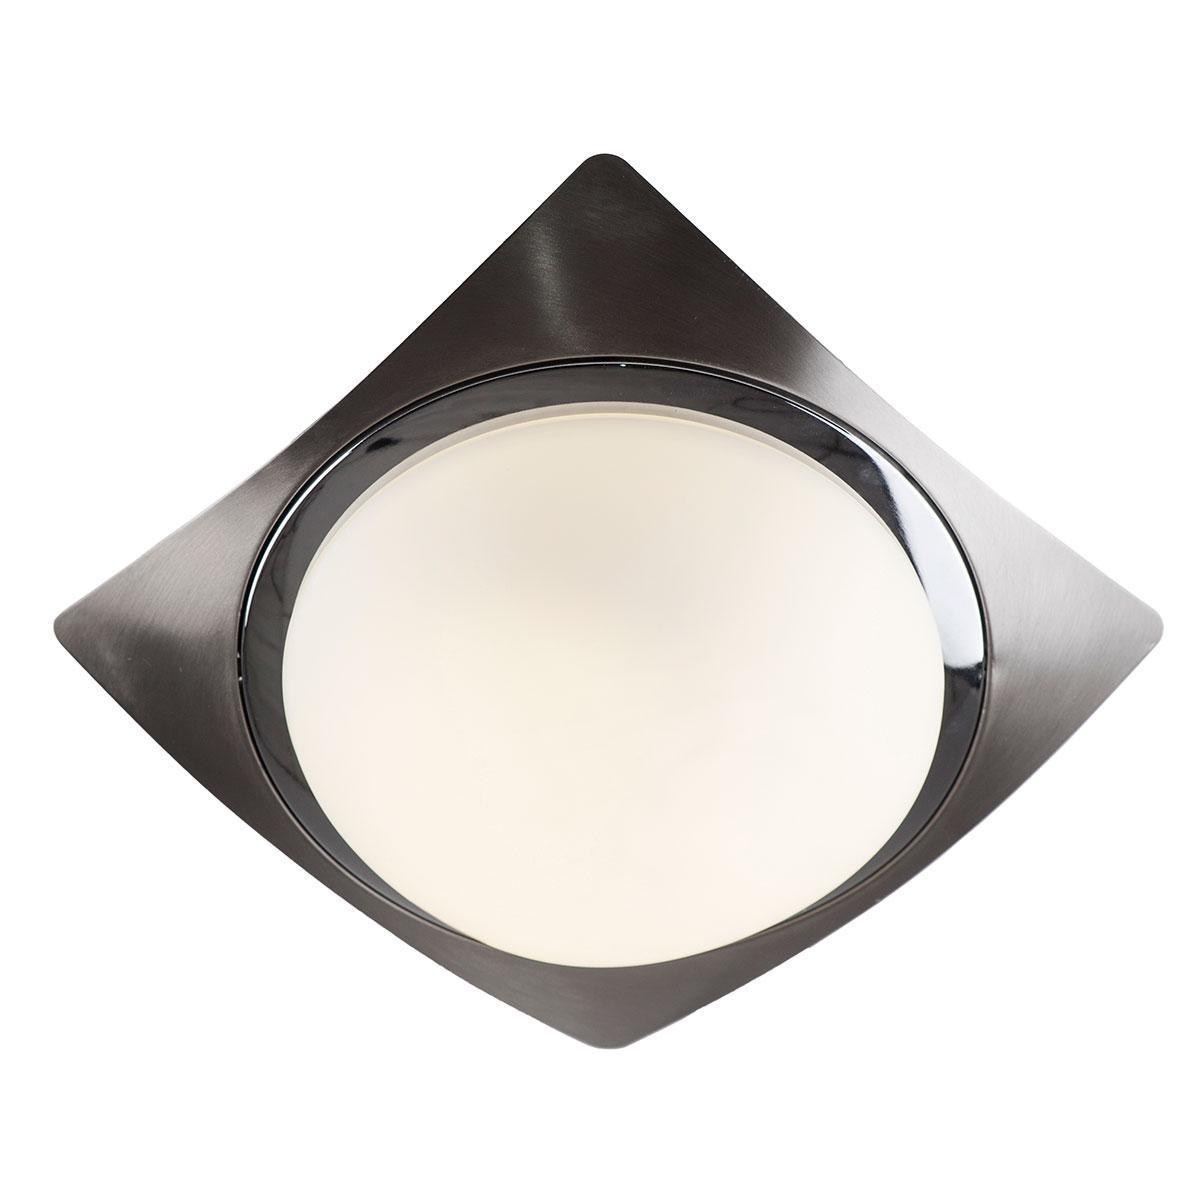 Потолочный светильник IDLamp Alessa 370/25PF-Whitechrome